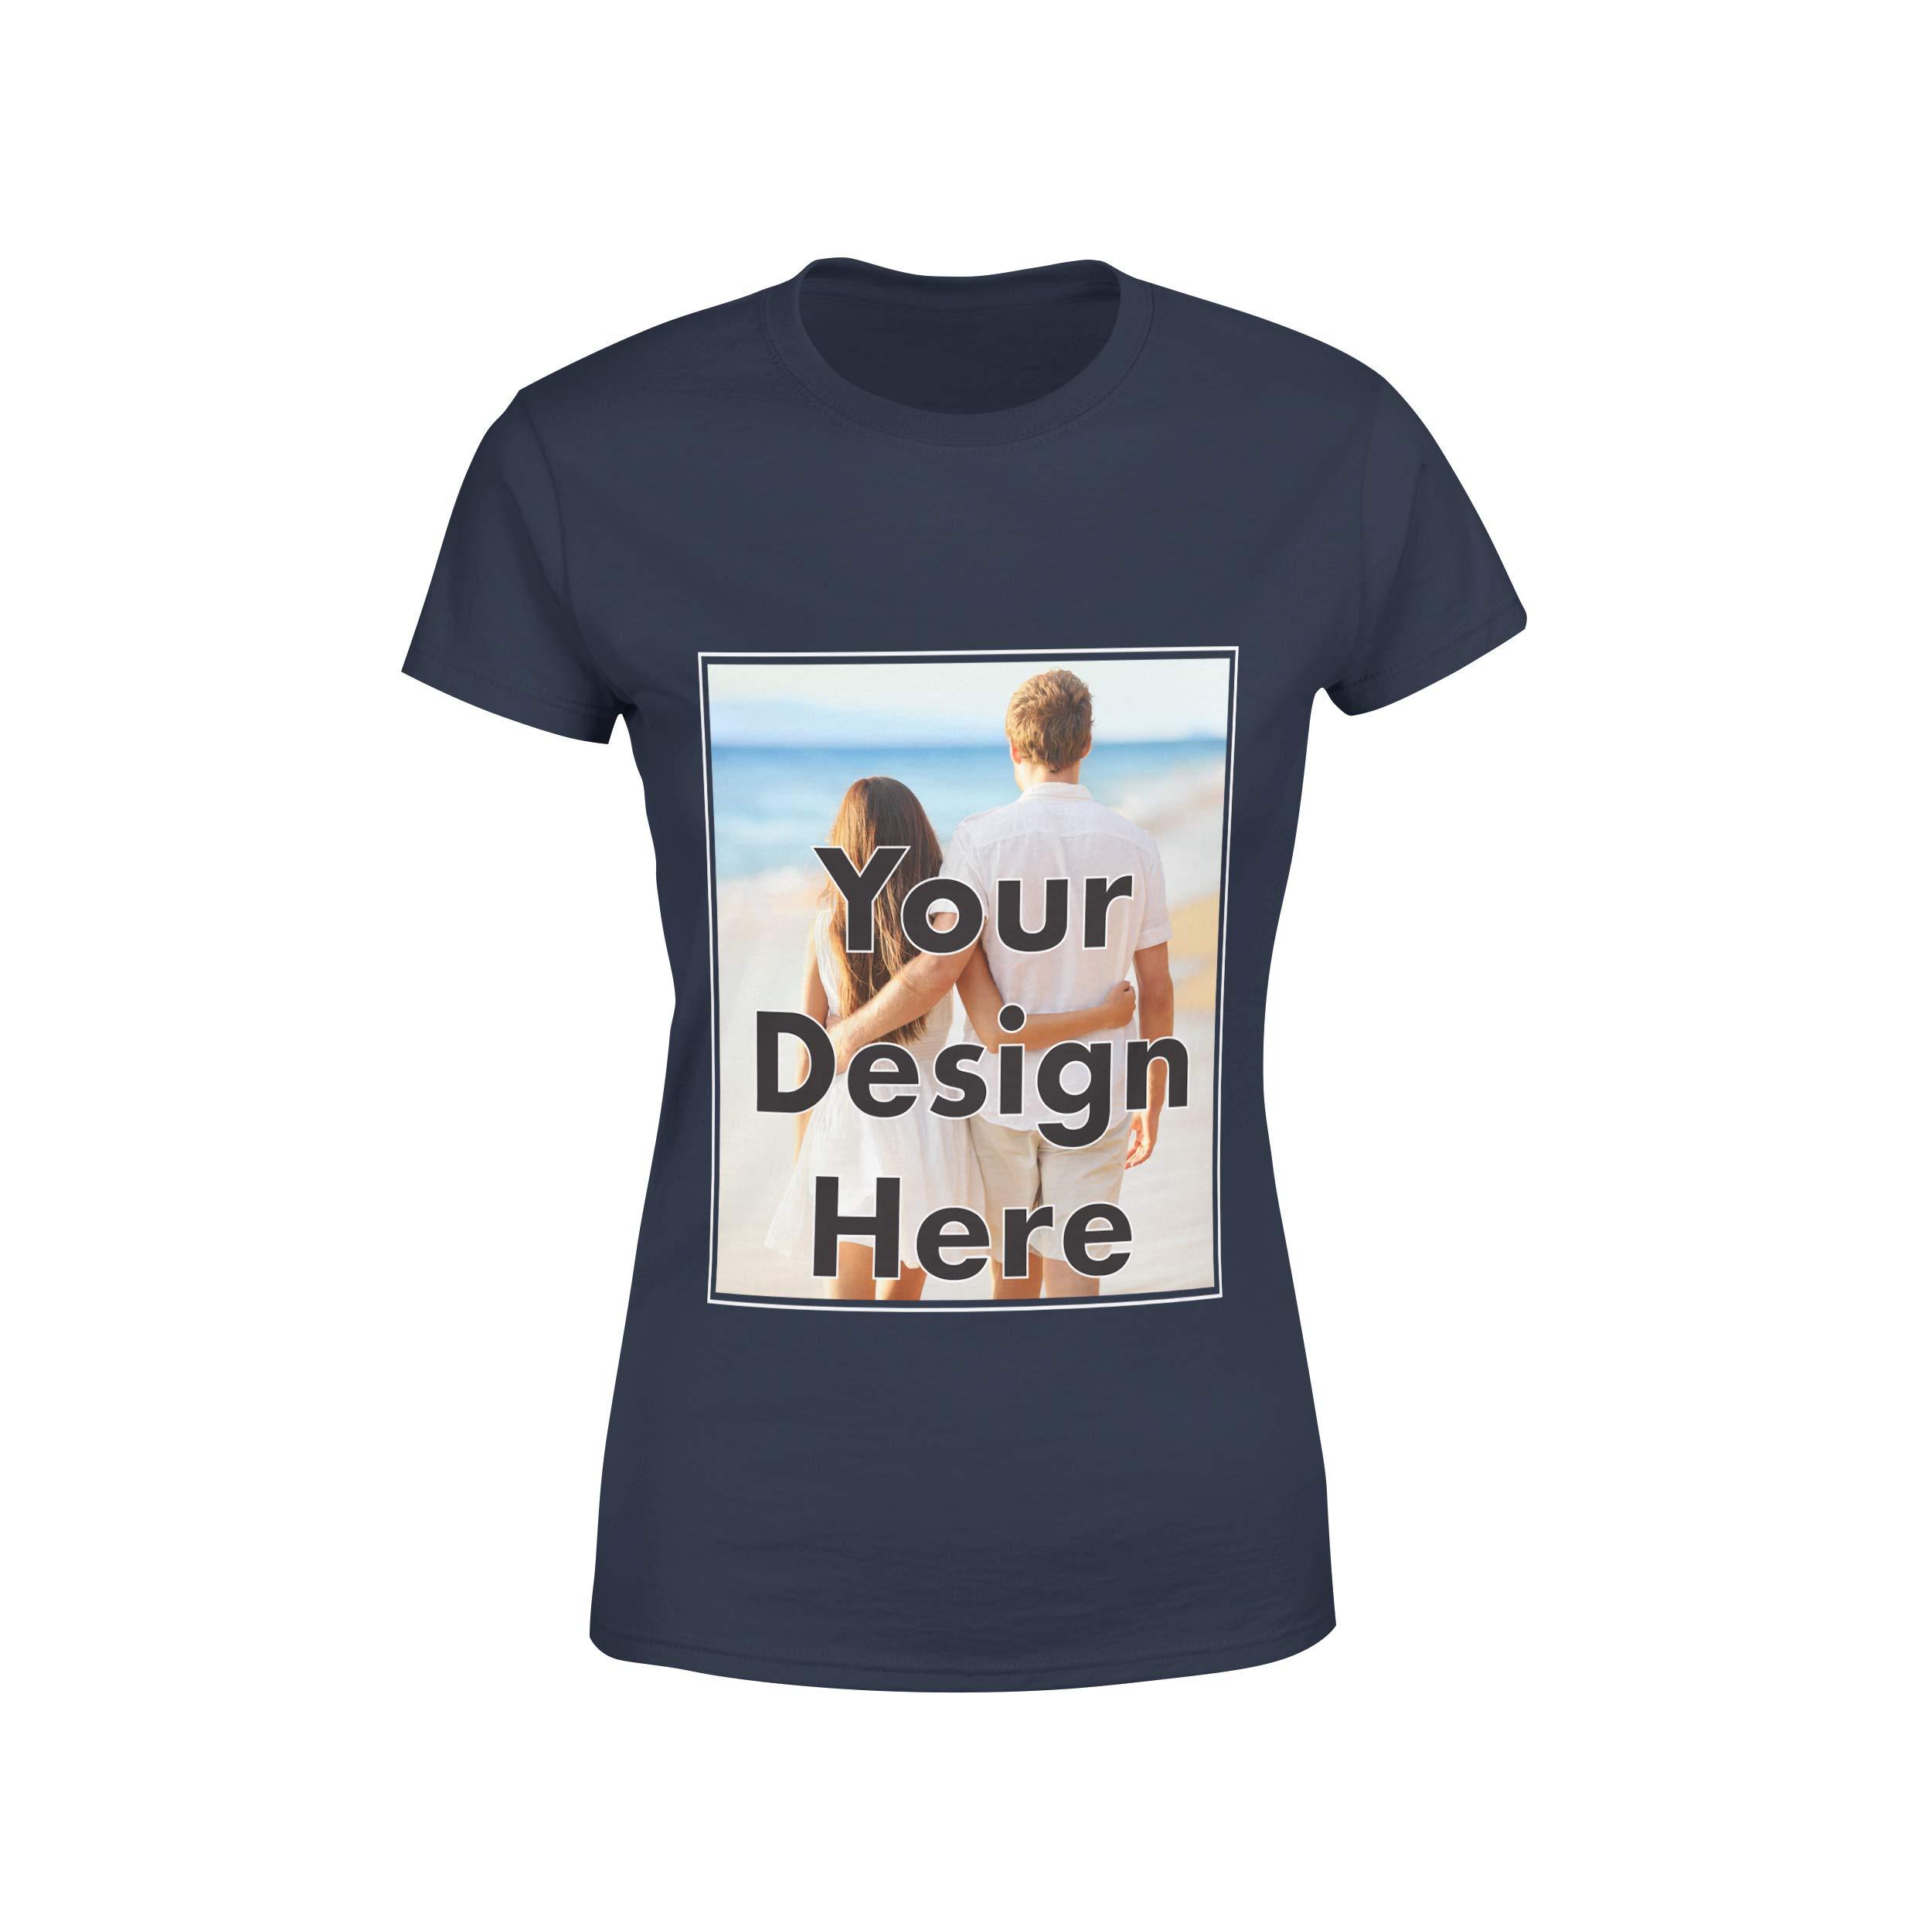 Arokan Customize Shirts For Women Men Custom T Shirts Design Your